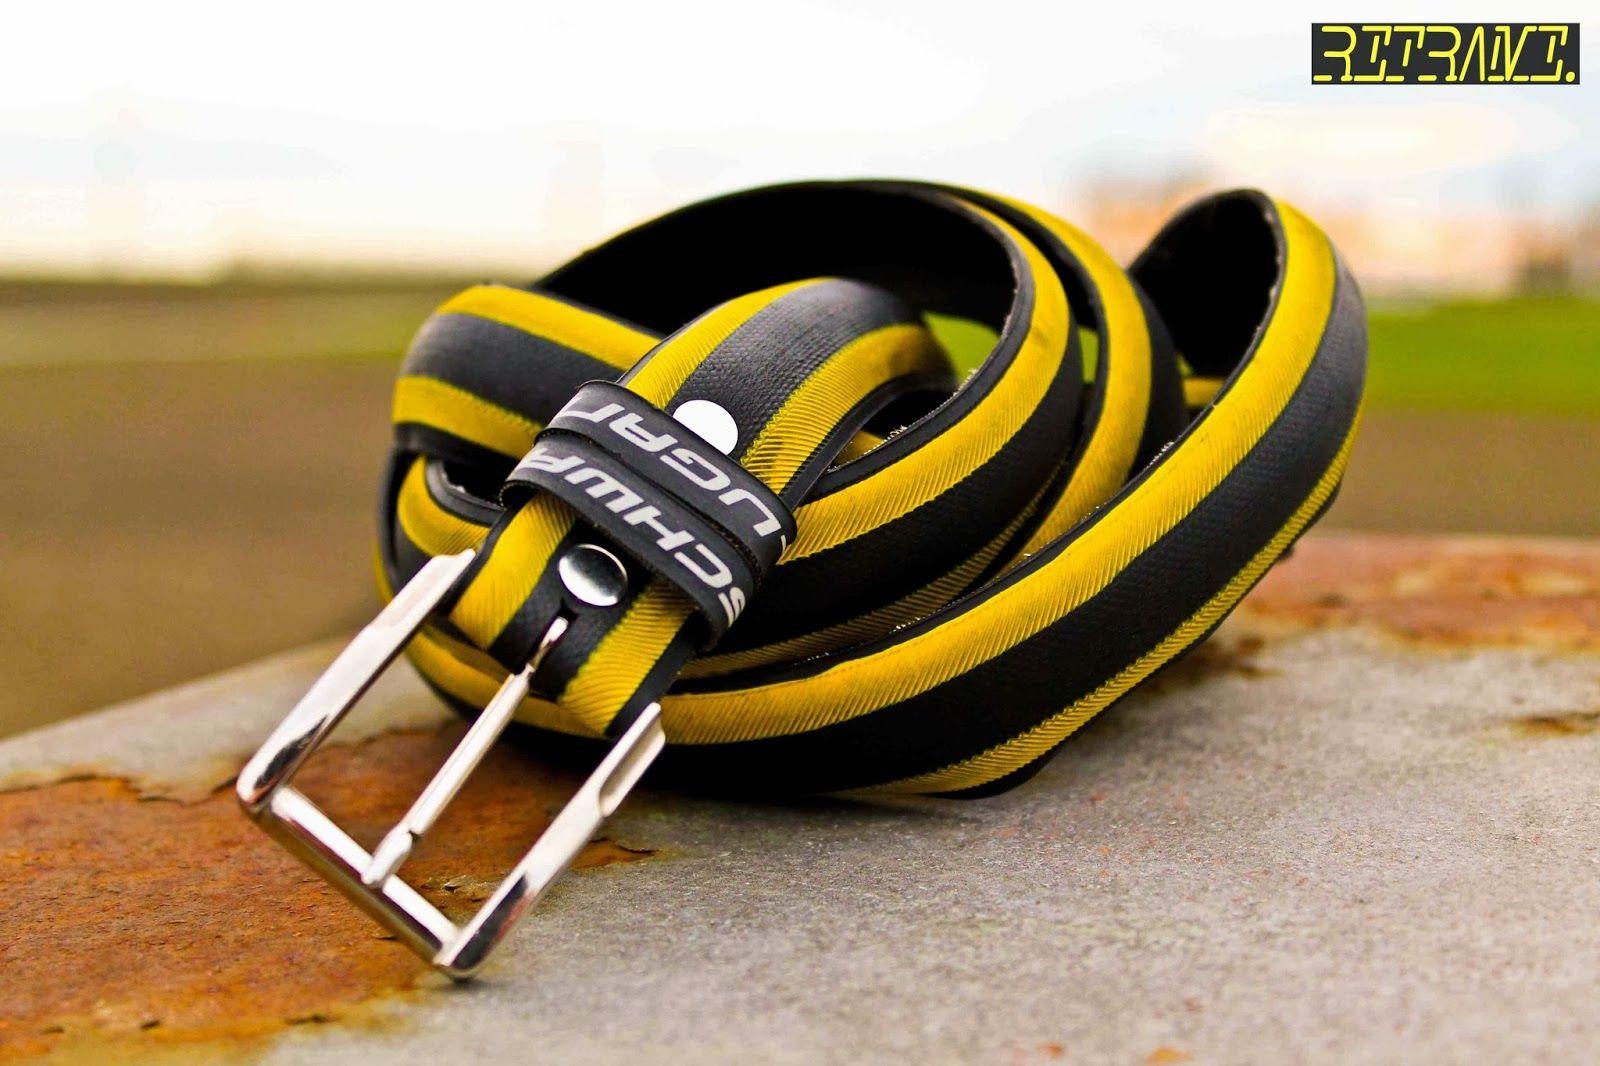 Schwalbe Lugano Yellow Black Tire Belt Www Reframe Cc Schwalbe